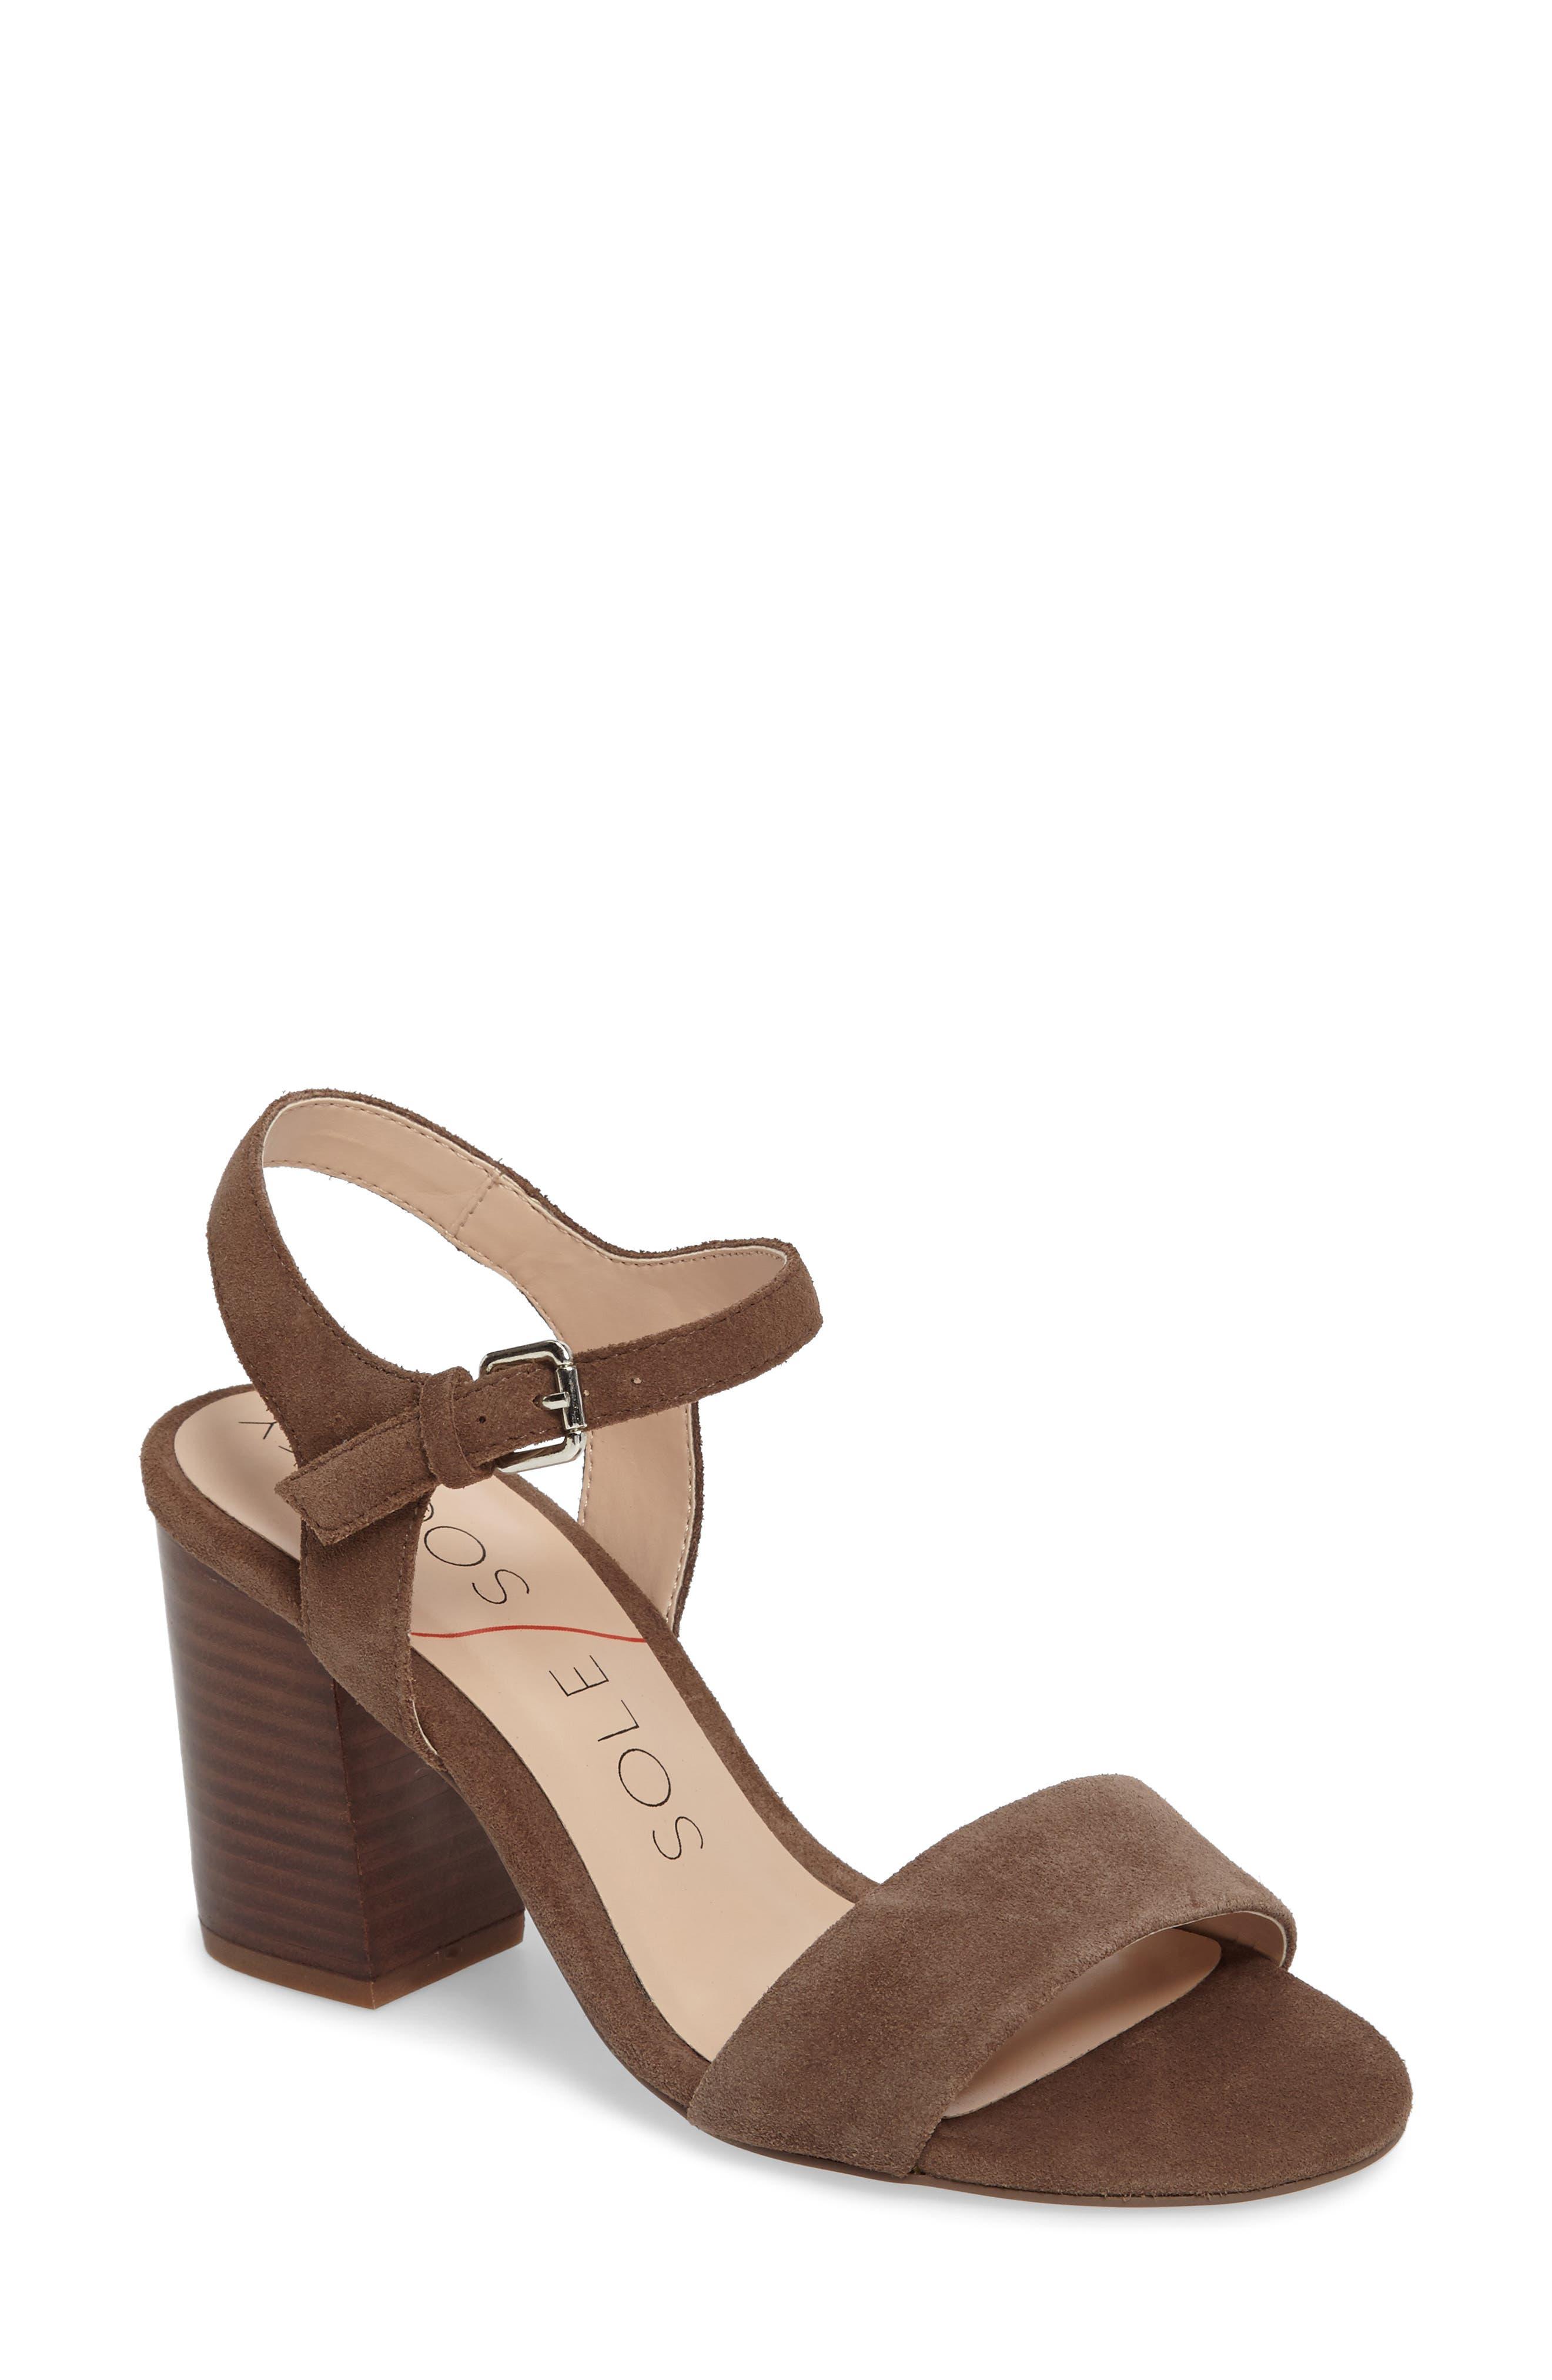 'Linny' Ankle Strap Sandal,                             Main thumbnail 2, color,